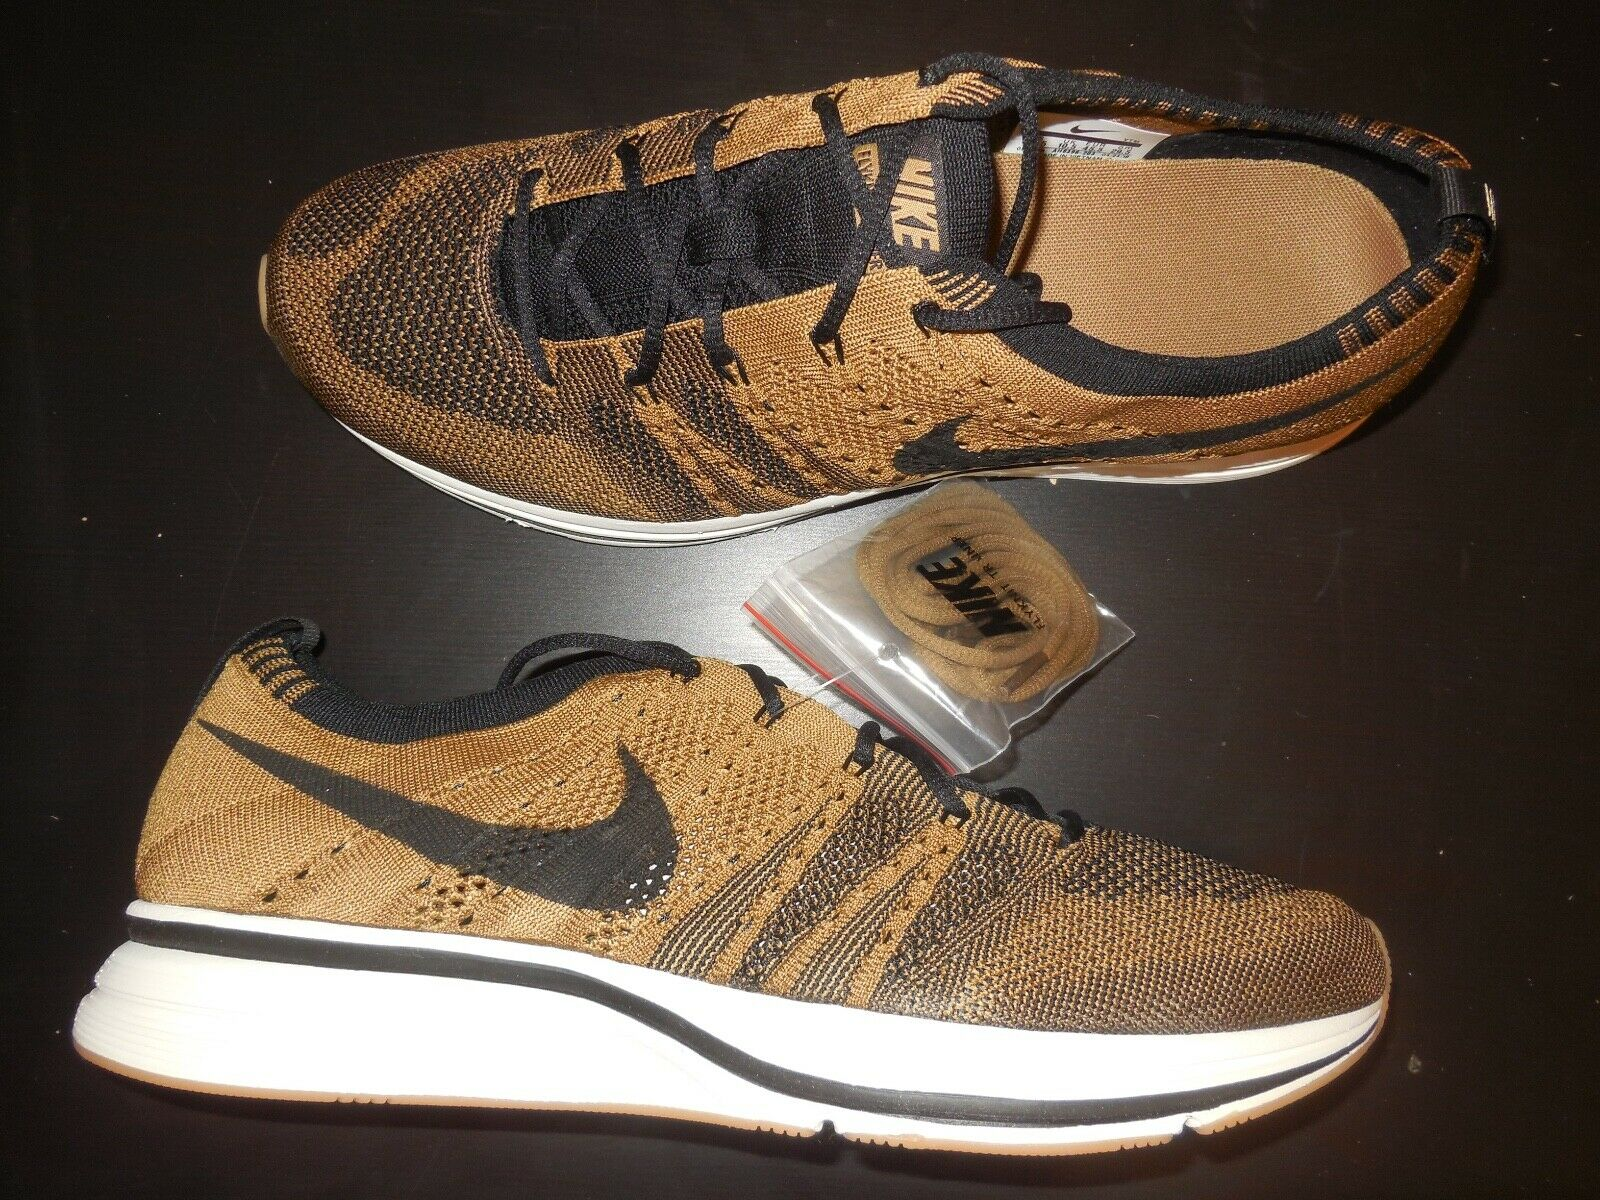 Men's Nike Flyknit Trainer shoes -StyleAH8396 203- Reg  150 -Sz 11.5 -NEW